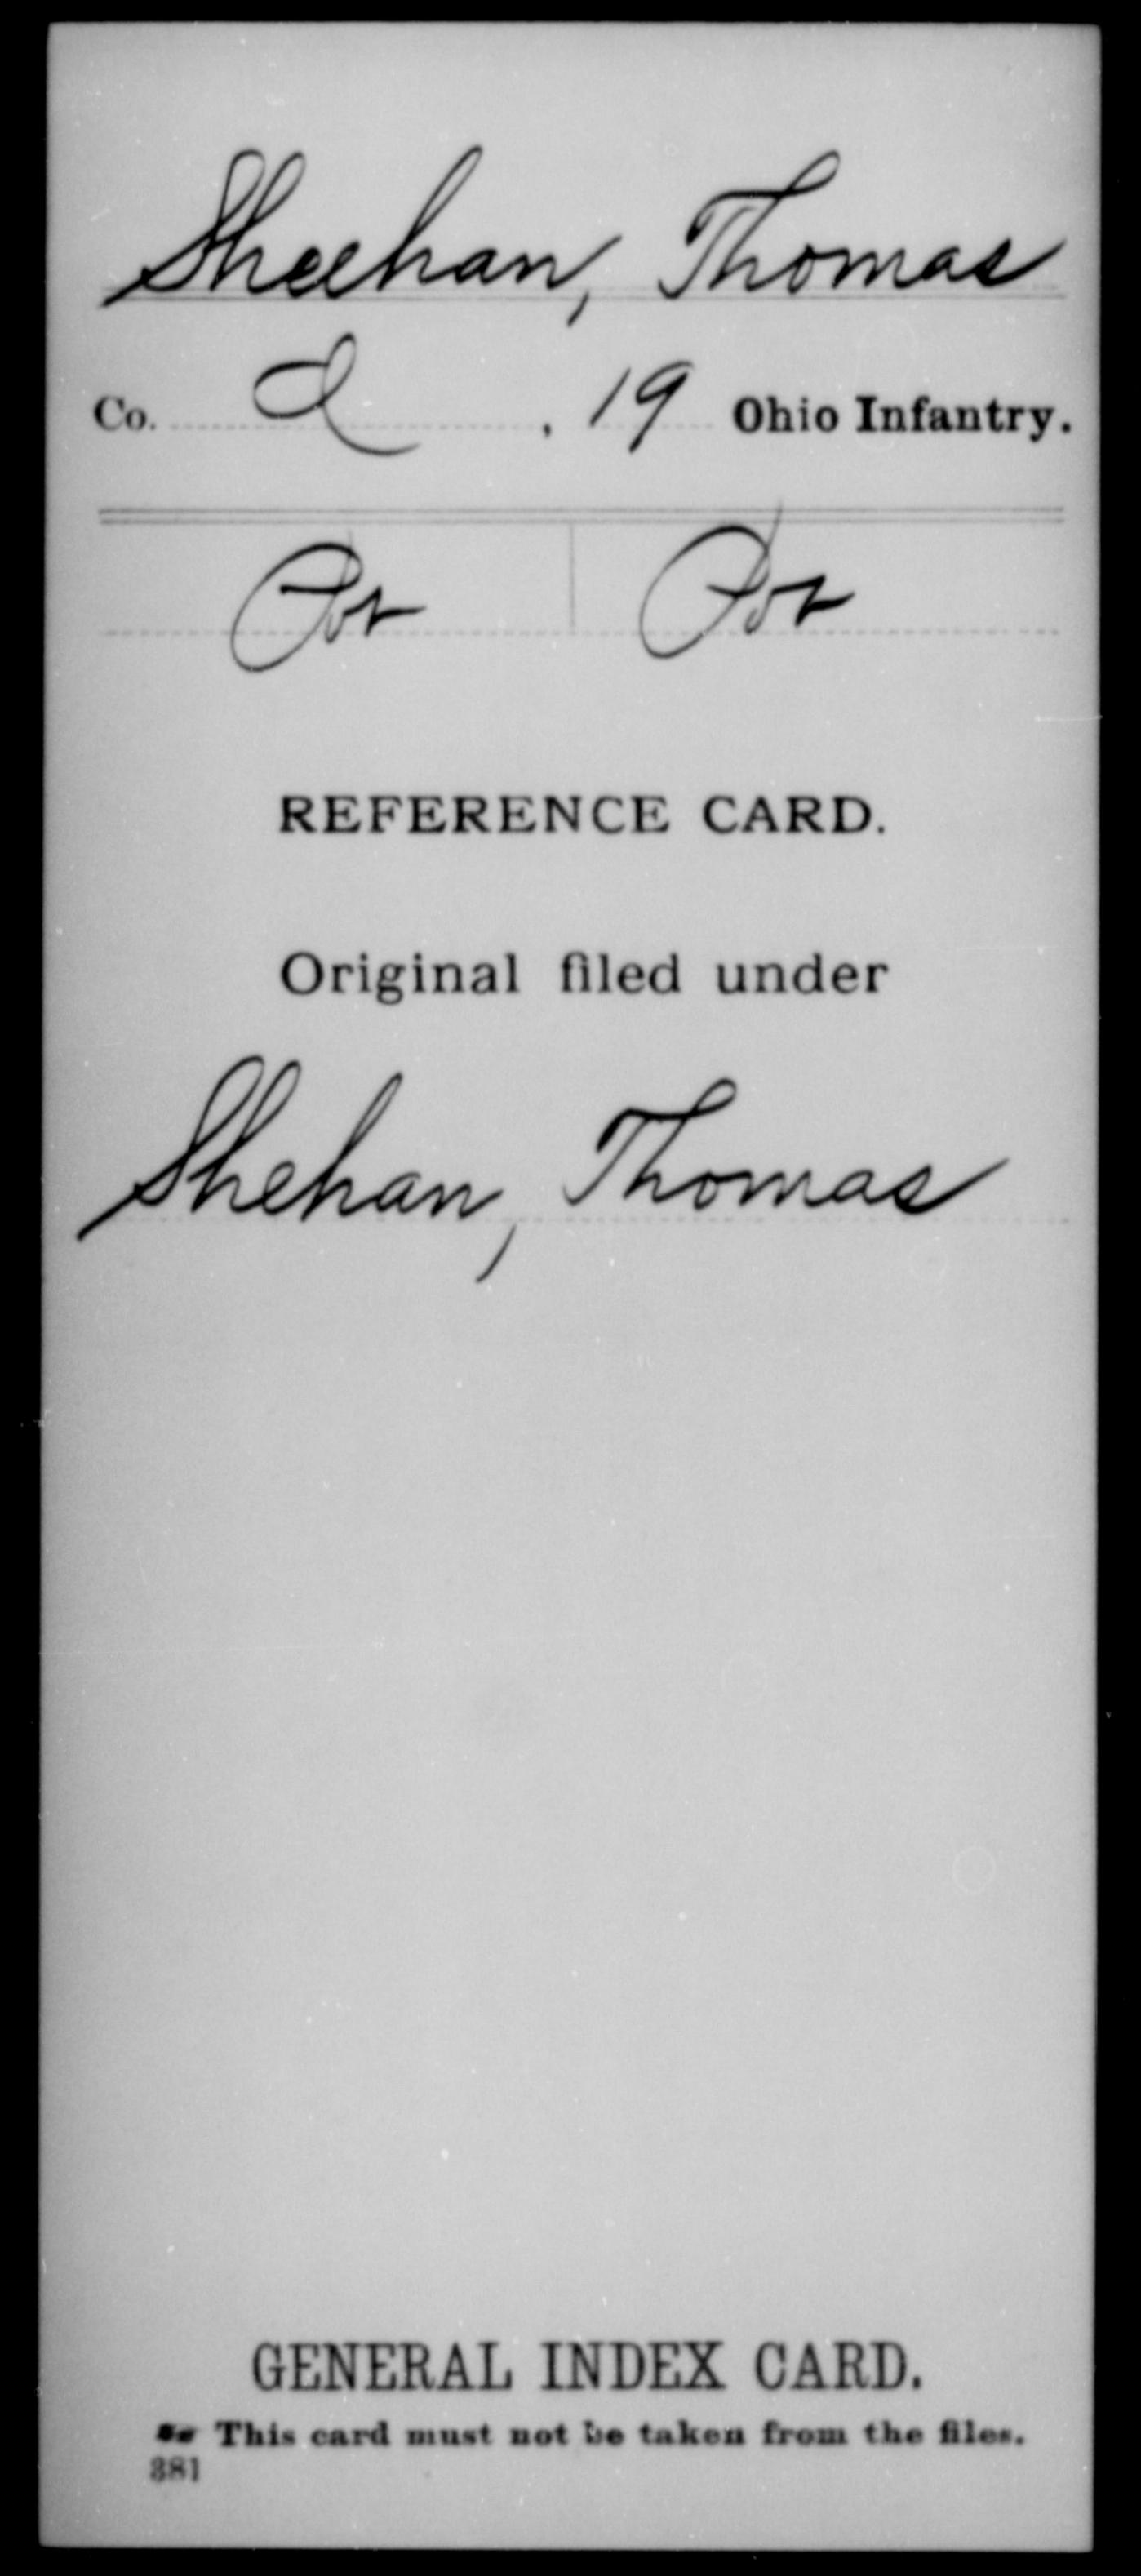 Sheehan, Thomas - Unit: 19th Infantry, Company: I - Enlistment Rank: Mus, Discharge Rank: Pvt